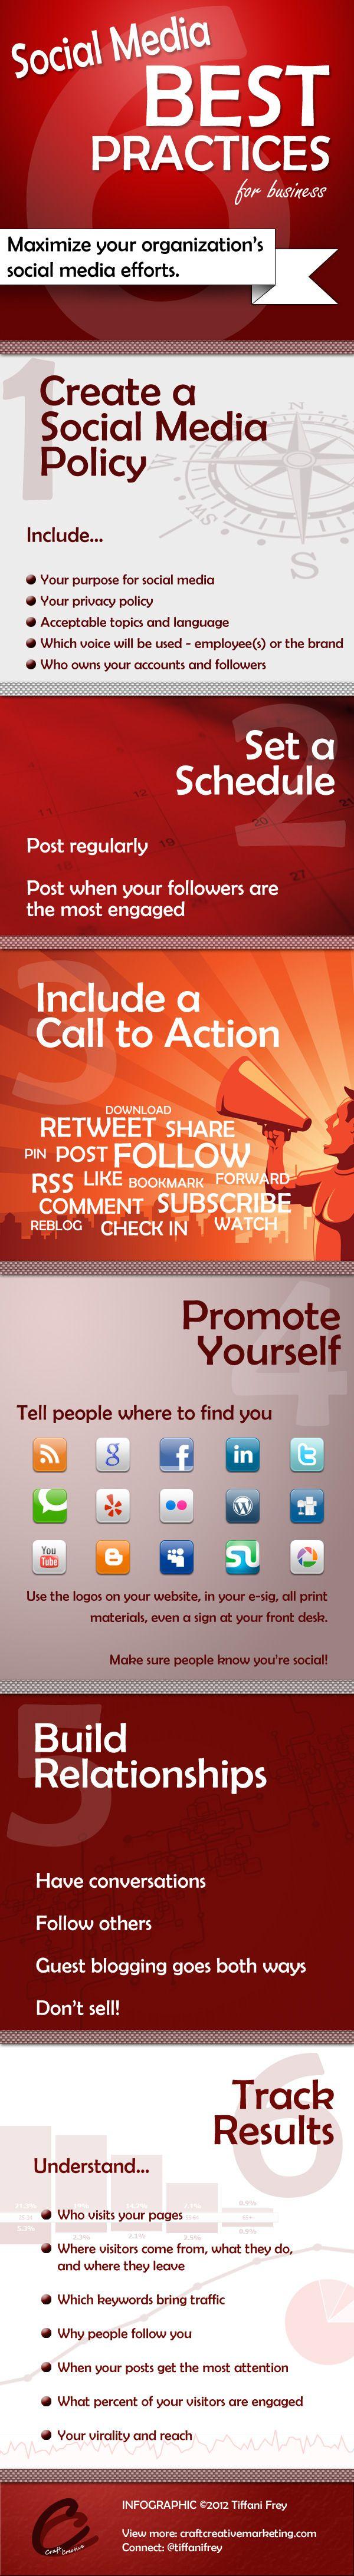 Best Practices of Social Media Enterprise